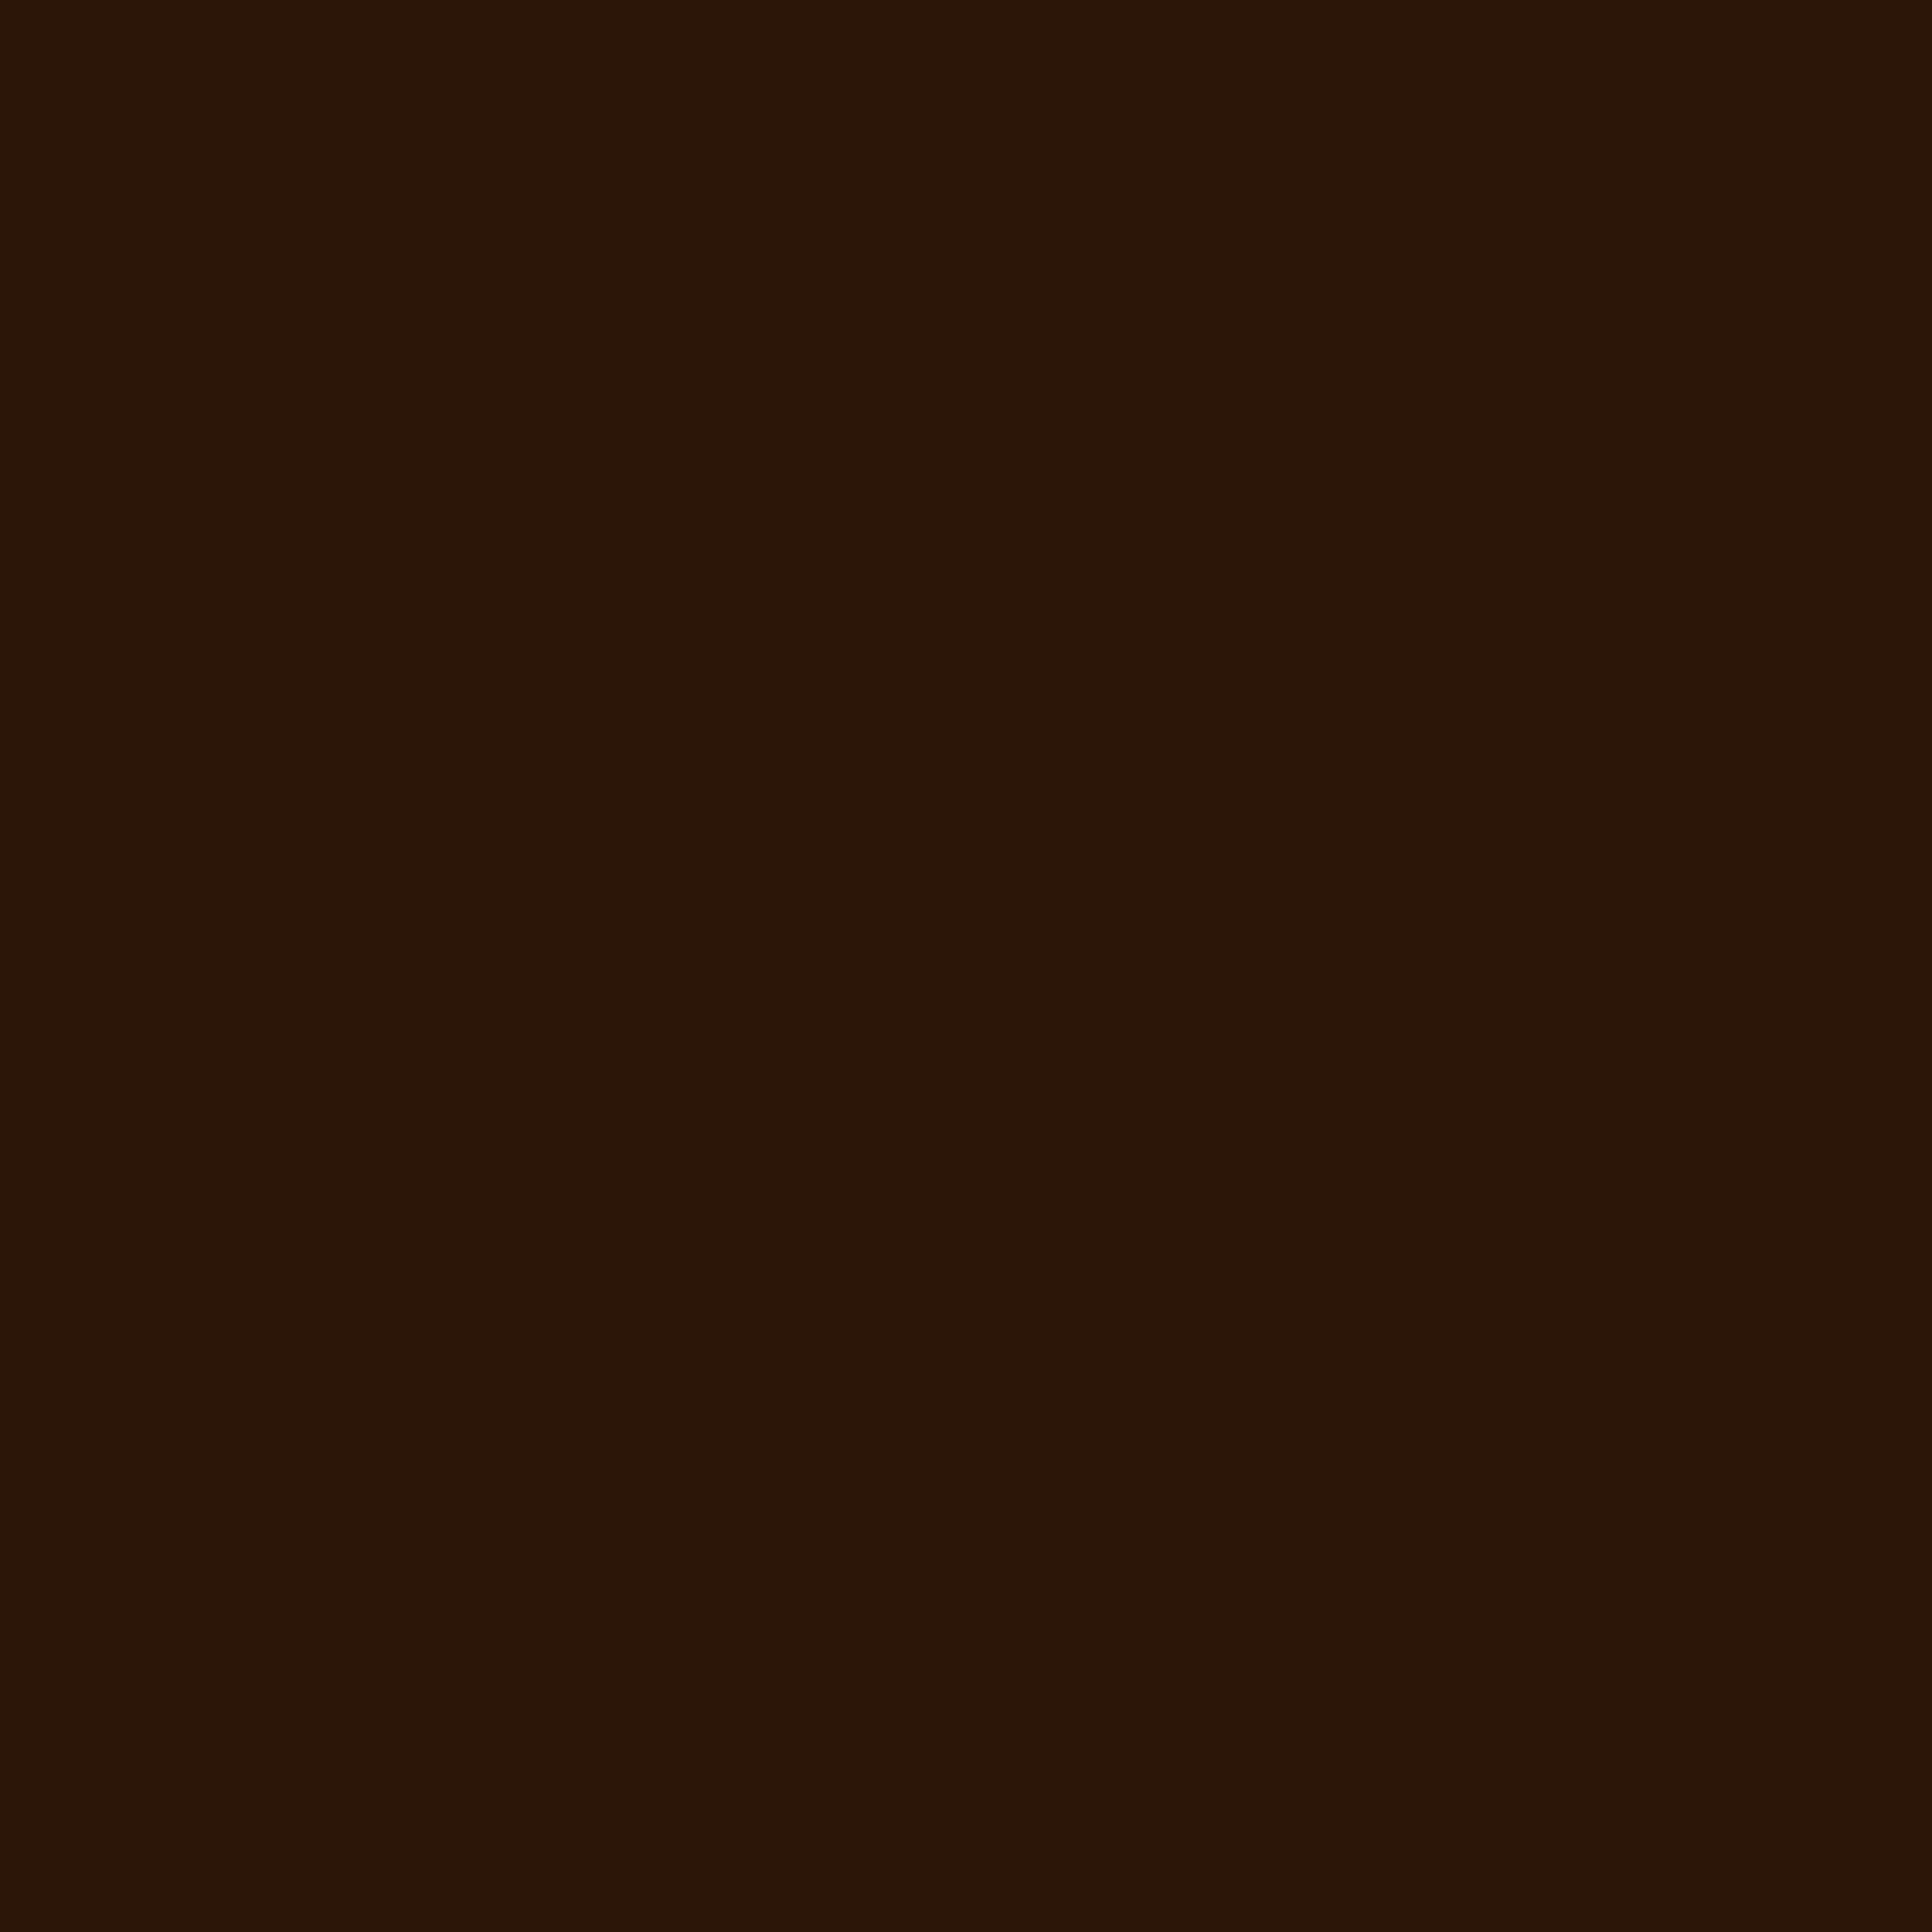 2732x2732 Zinnwaldite Brown Solid Color Background